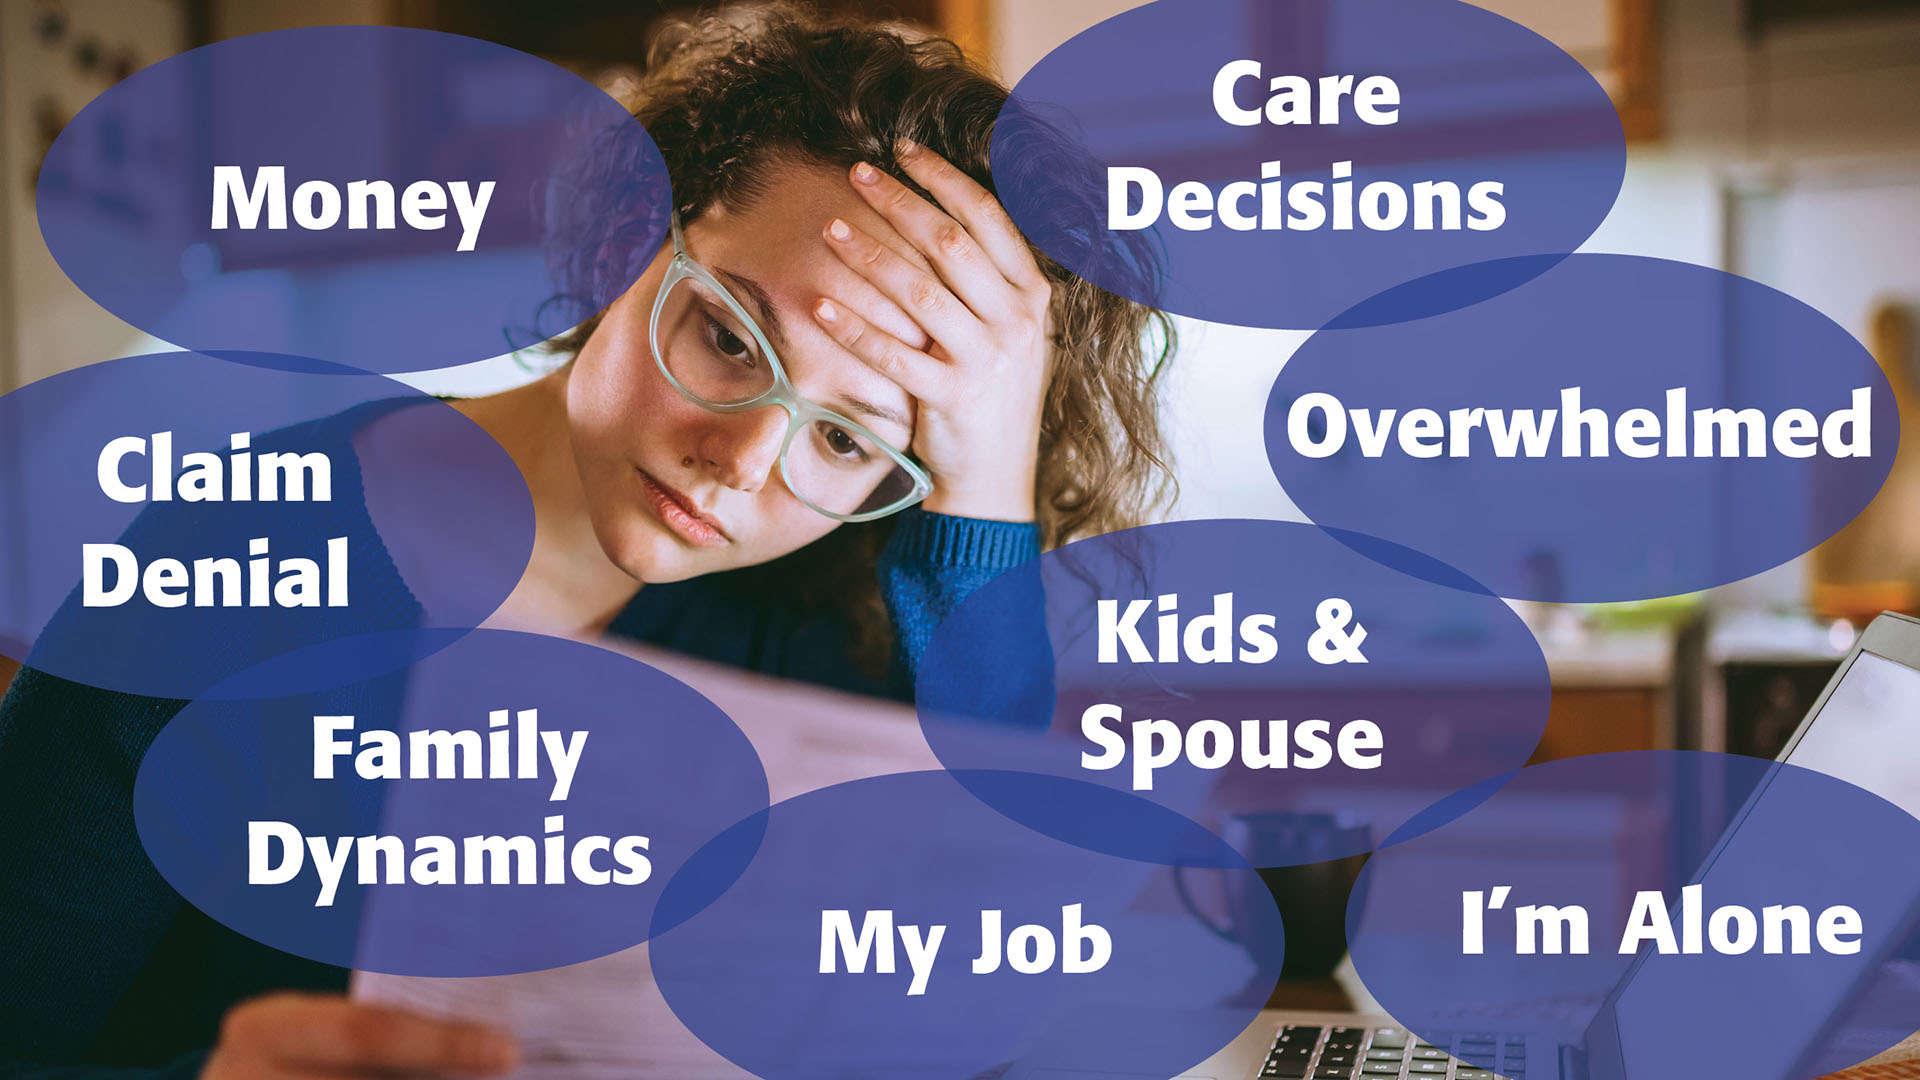 Money, Claim Denials, Family Dynamics, Job, My Spouse, Care Decisions, Overwhelmed